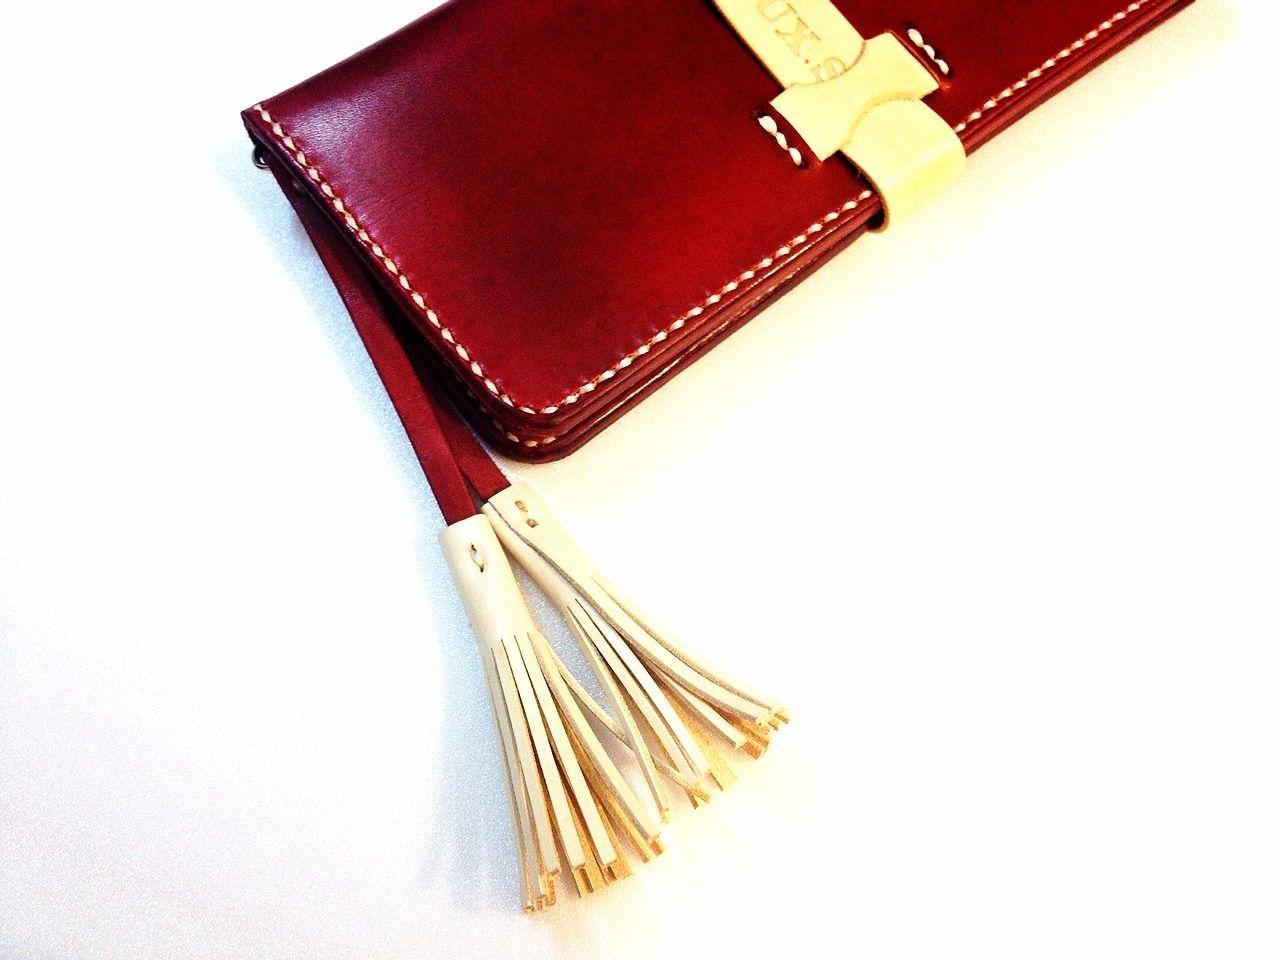 Tuff detail on wallet